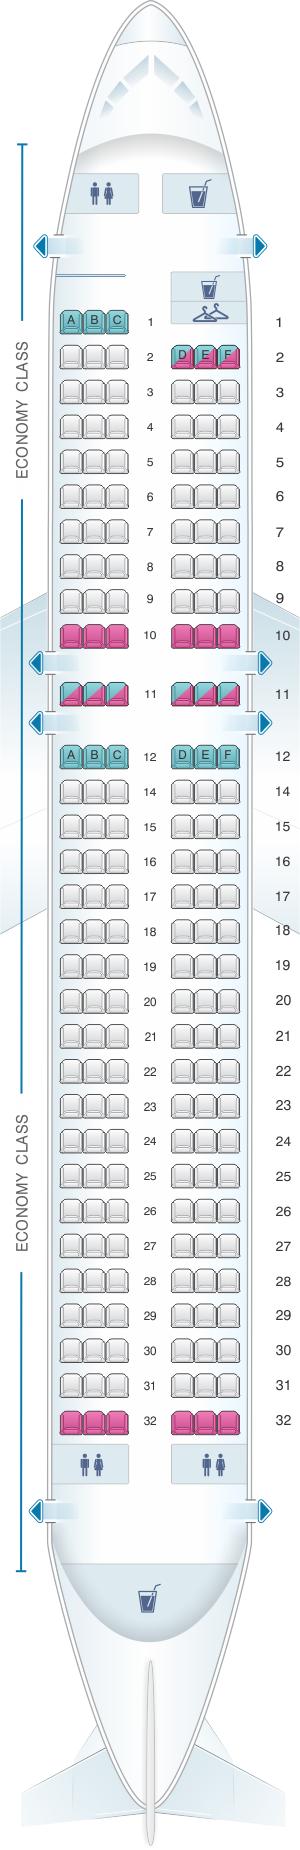 Seat Map Iberia Airbus A320 Express Seatmaestro